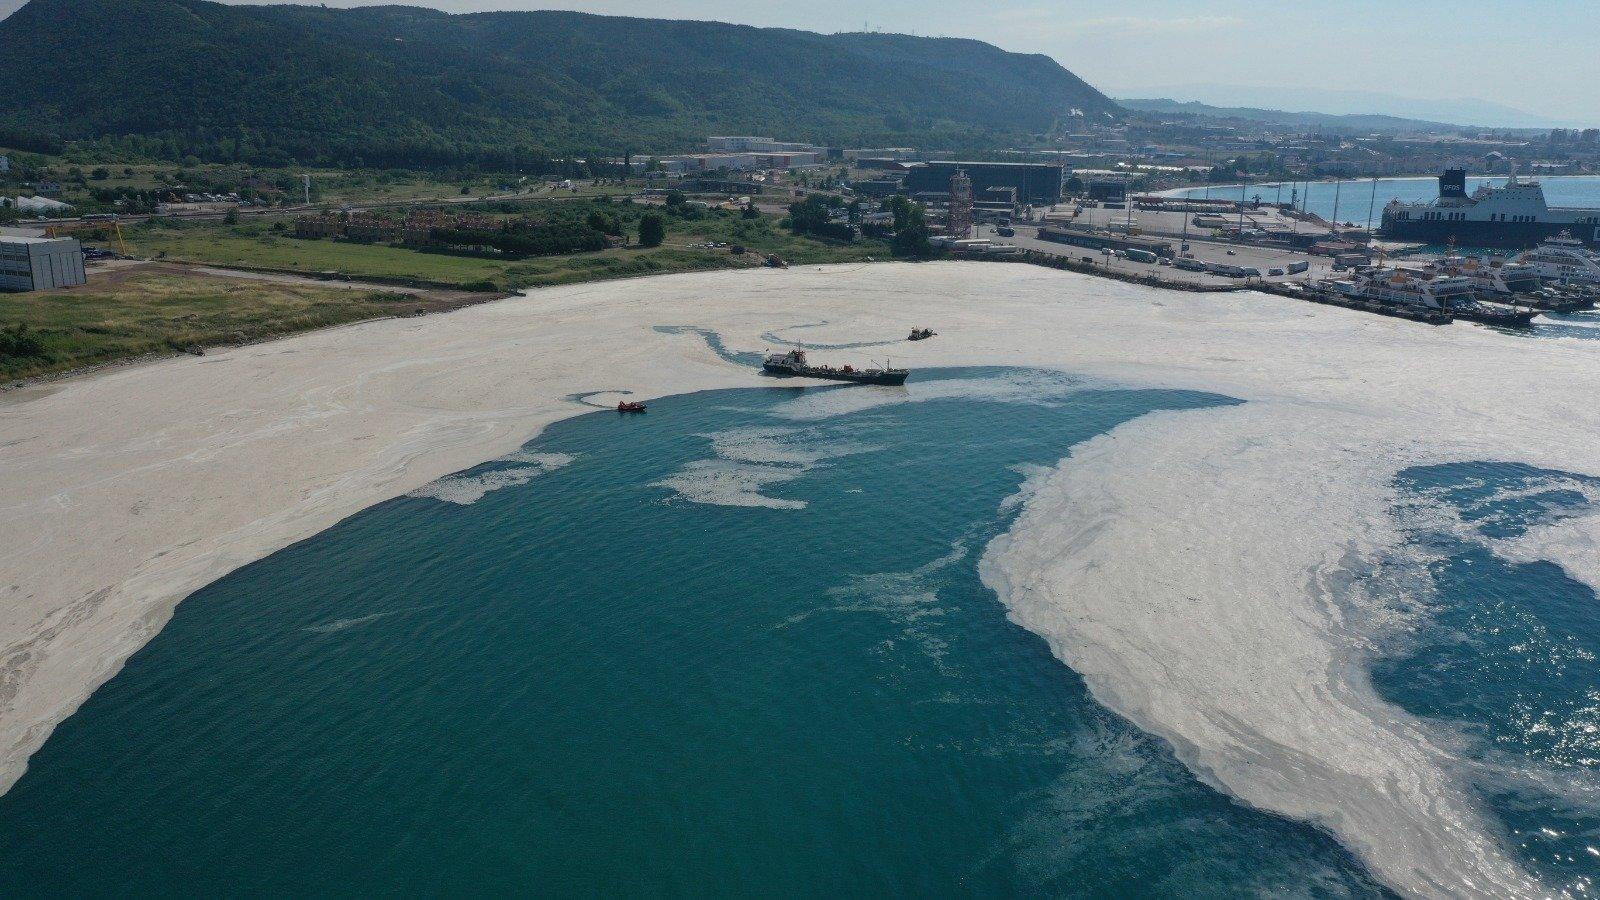 Aerial view of marine mucilage in Yalova, northwestern Turkey, June 12, 2021. Scientists say Çınarcık Basin near Yalova is home to another danger caused by hydrogen sulfide. (DHA PHOTO)